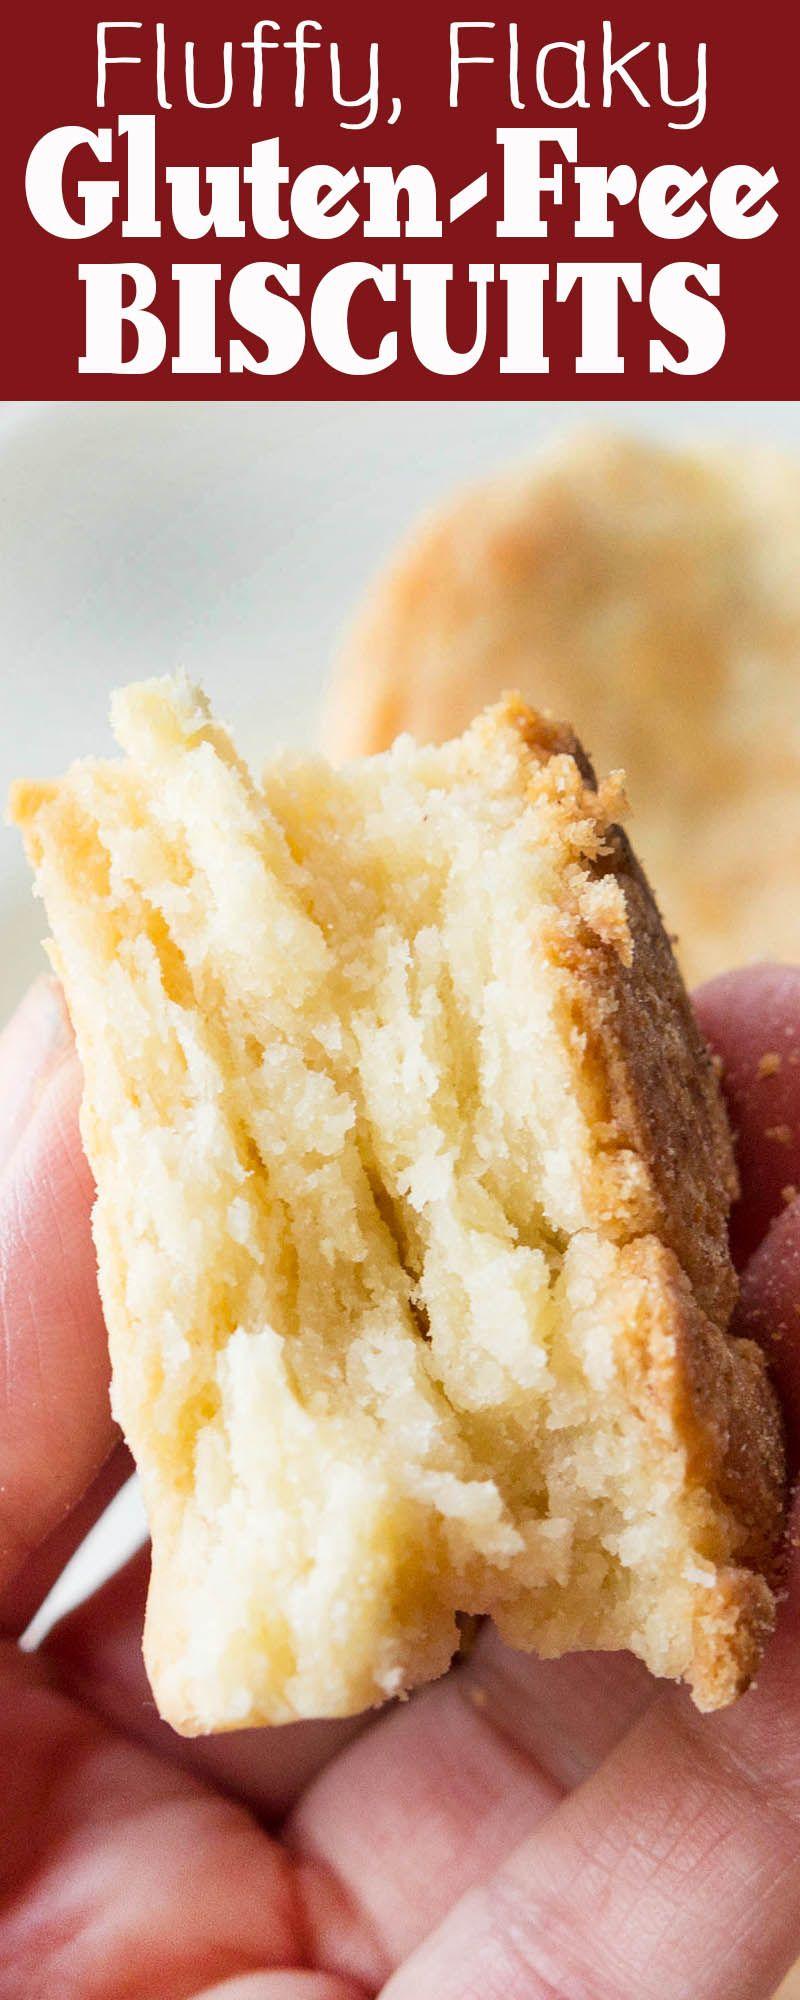 How To Make Gluten Free Biscuits Recipe In 2020 Gluten Free